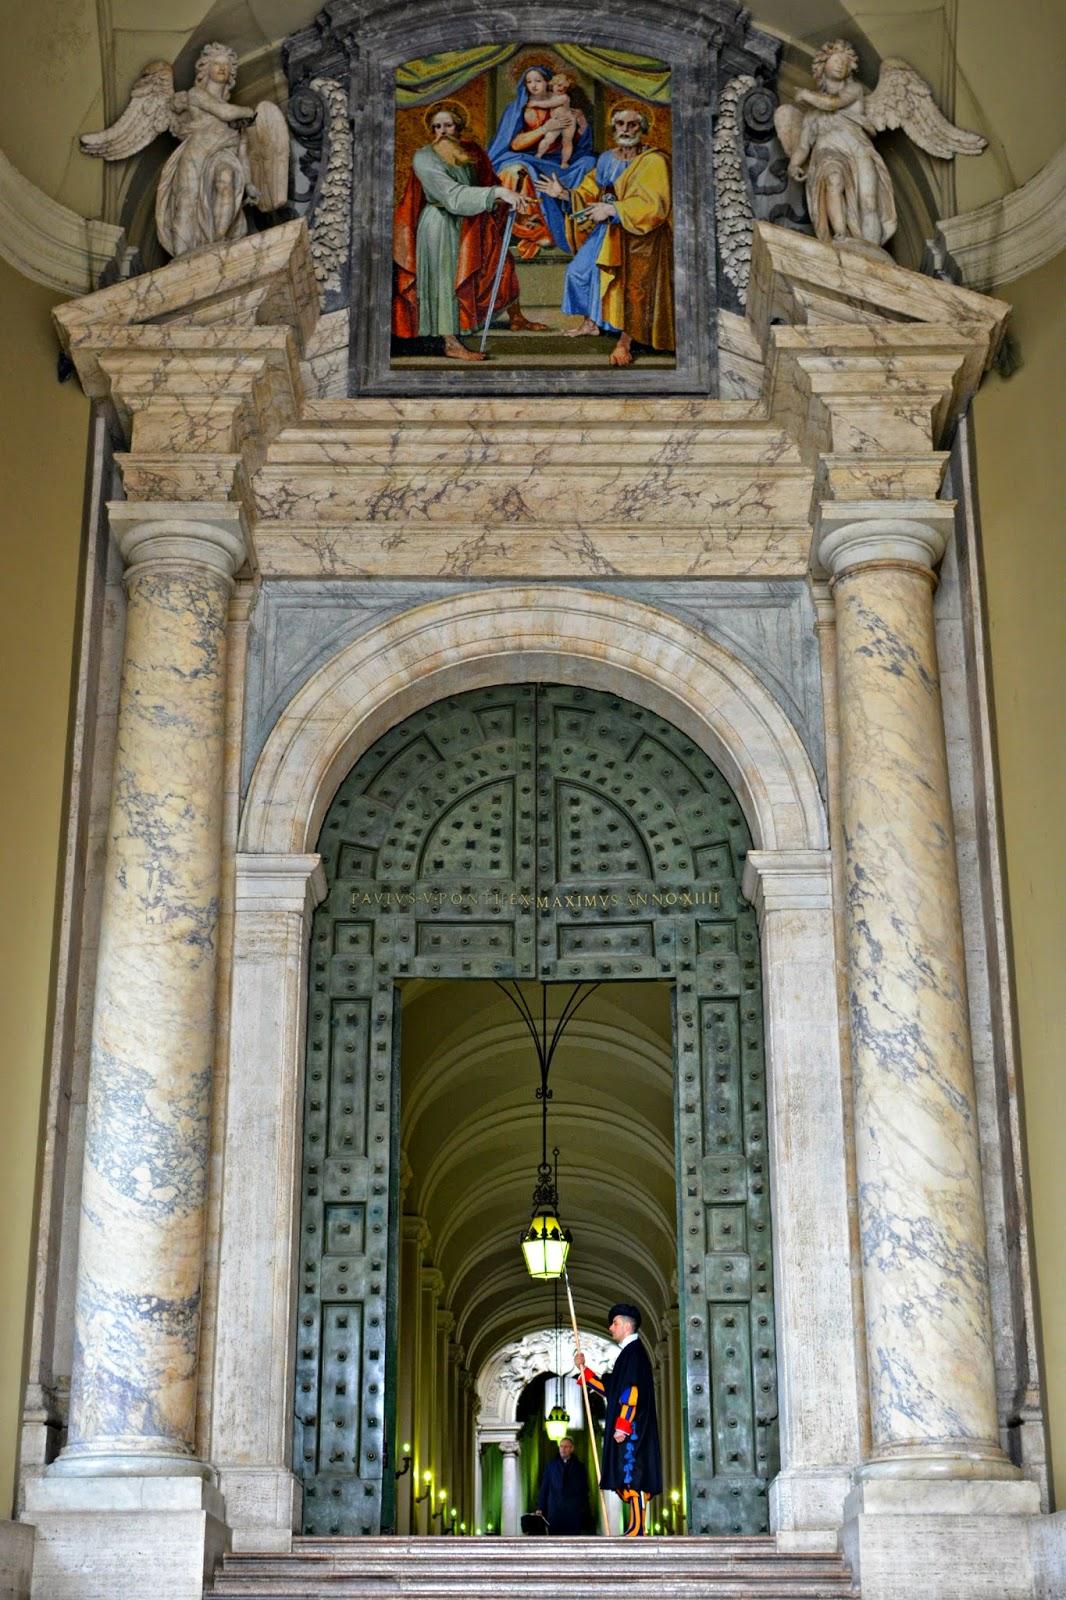 swiss guard at st peter's basilica vatican city